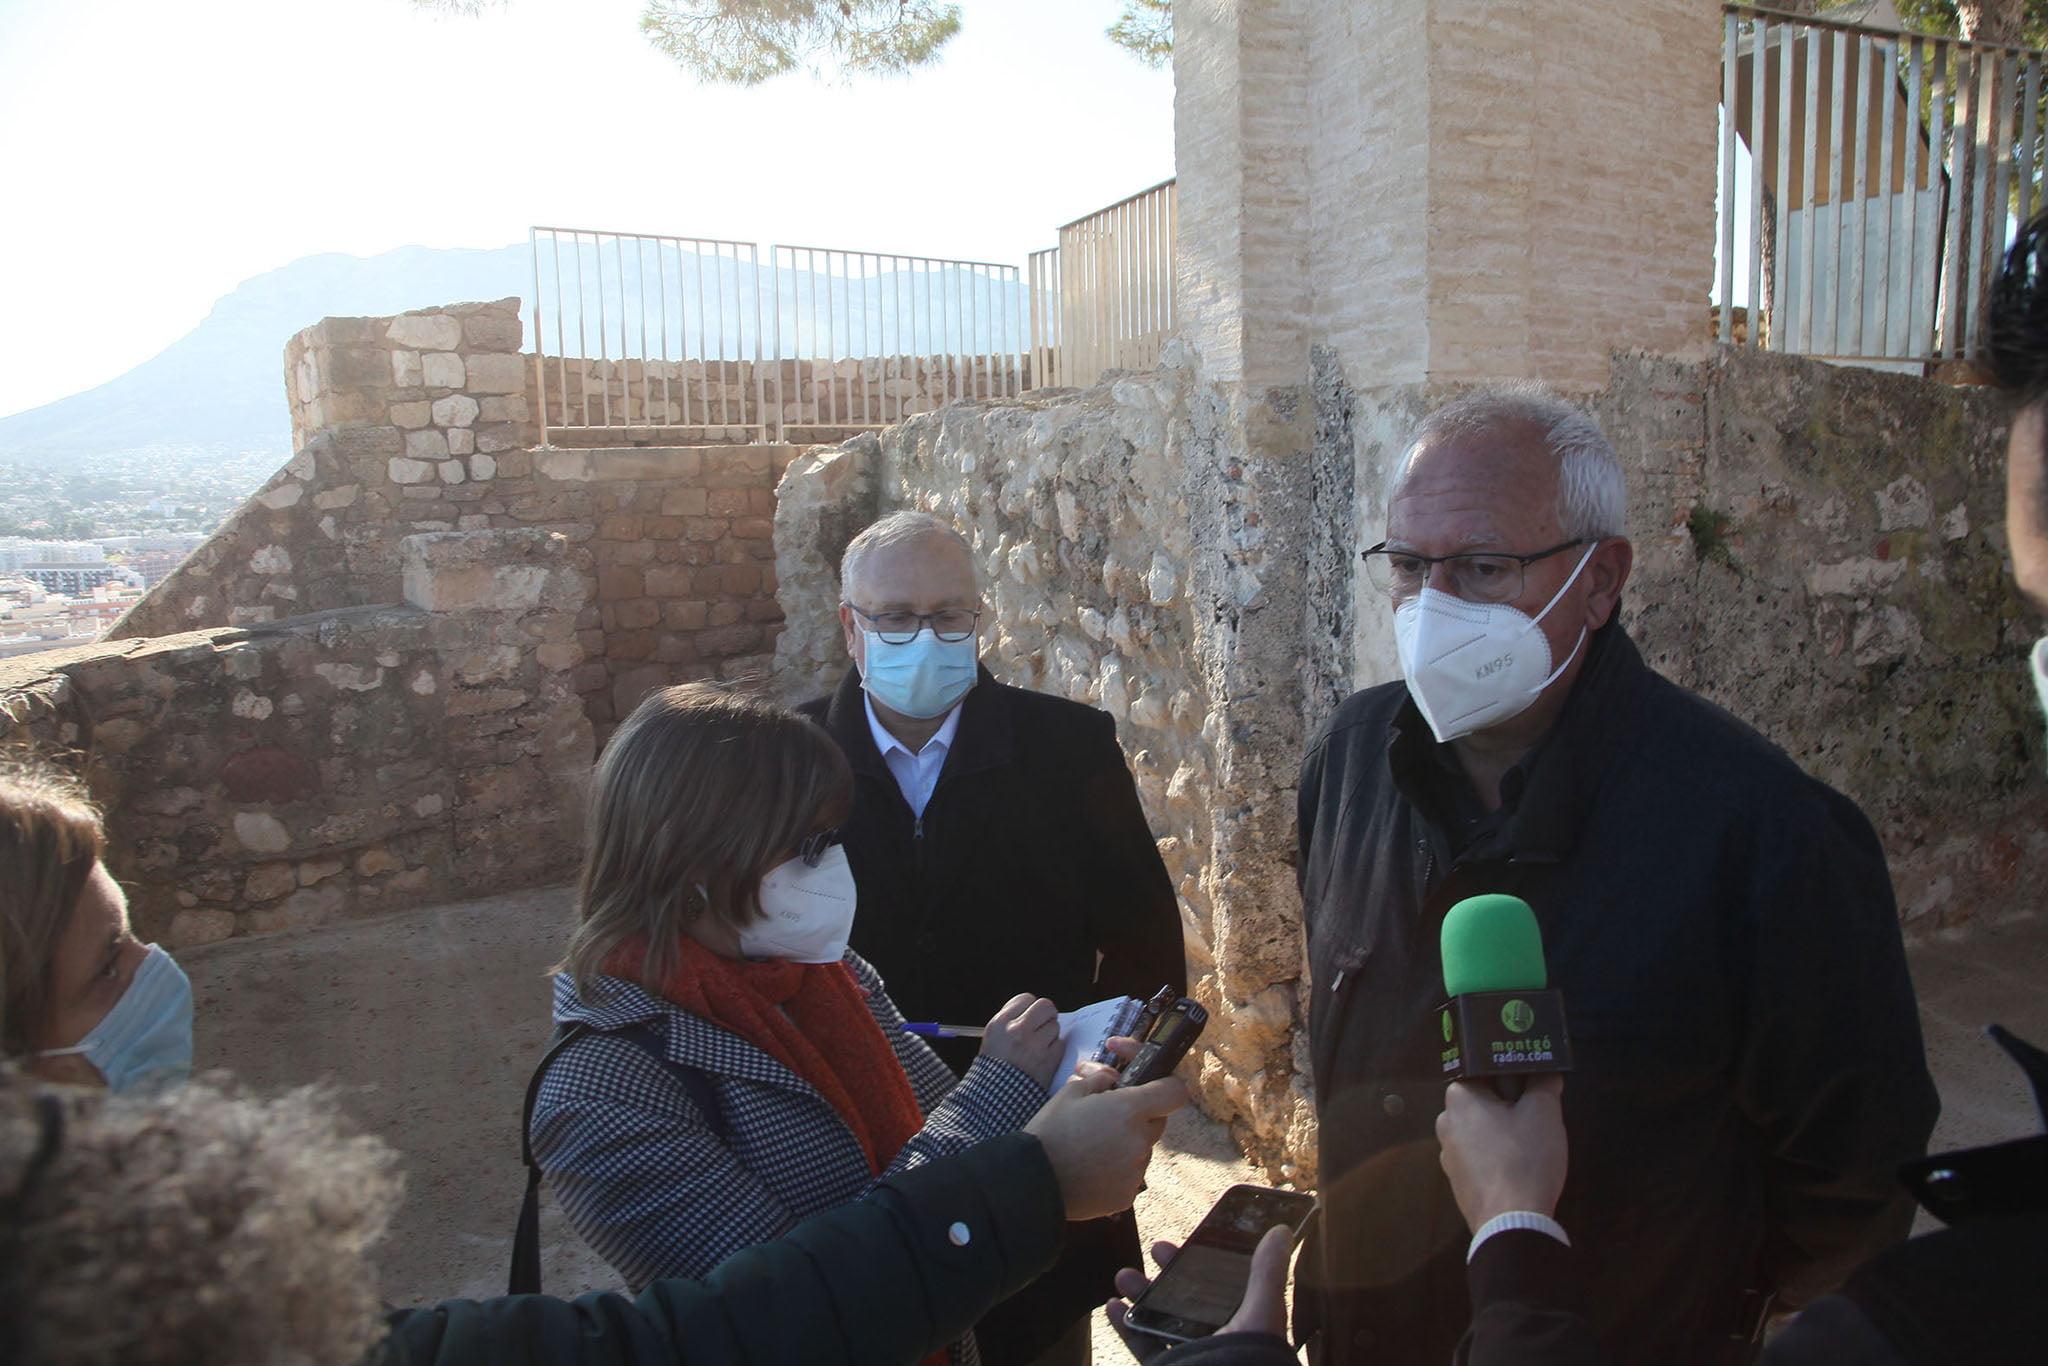 Vicent Grimalt erklärt das Projekt des Verger Alt del Castillo de Dénia